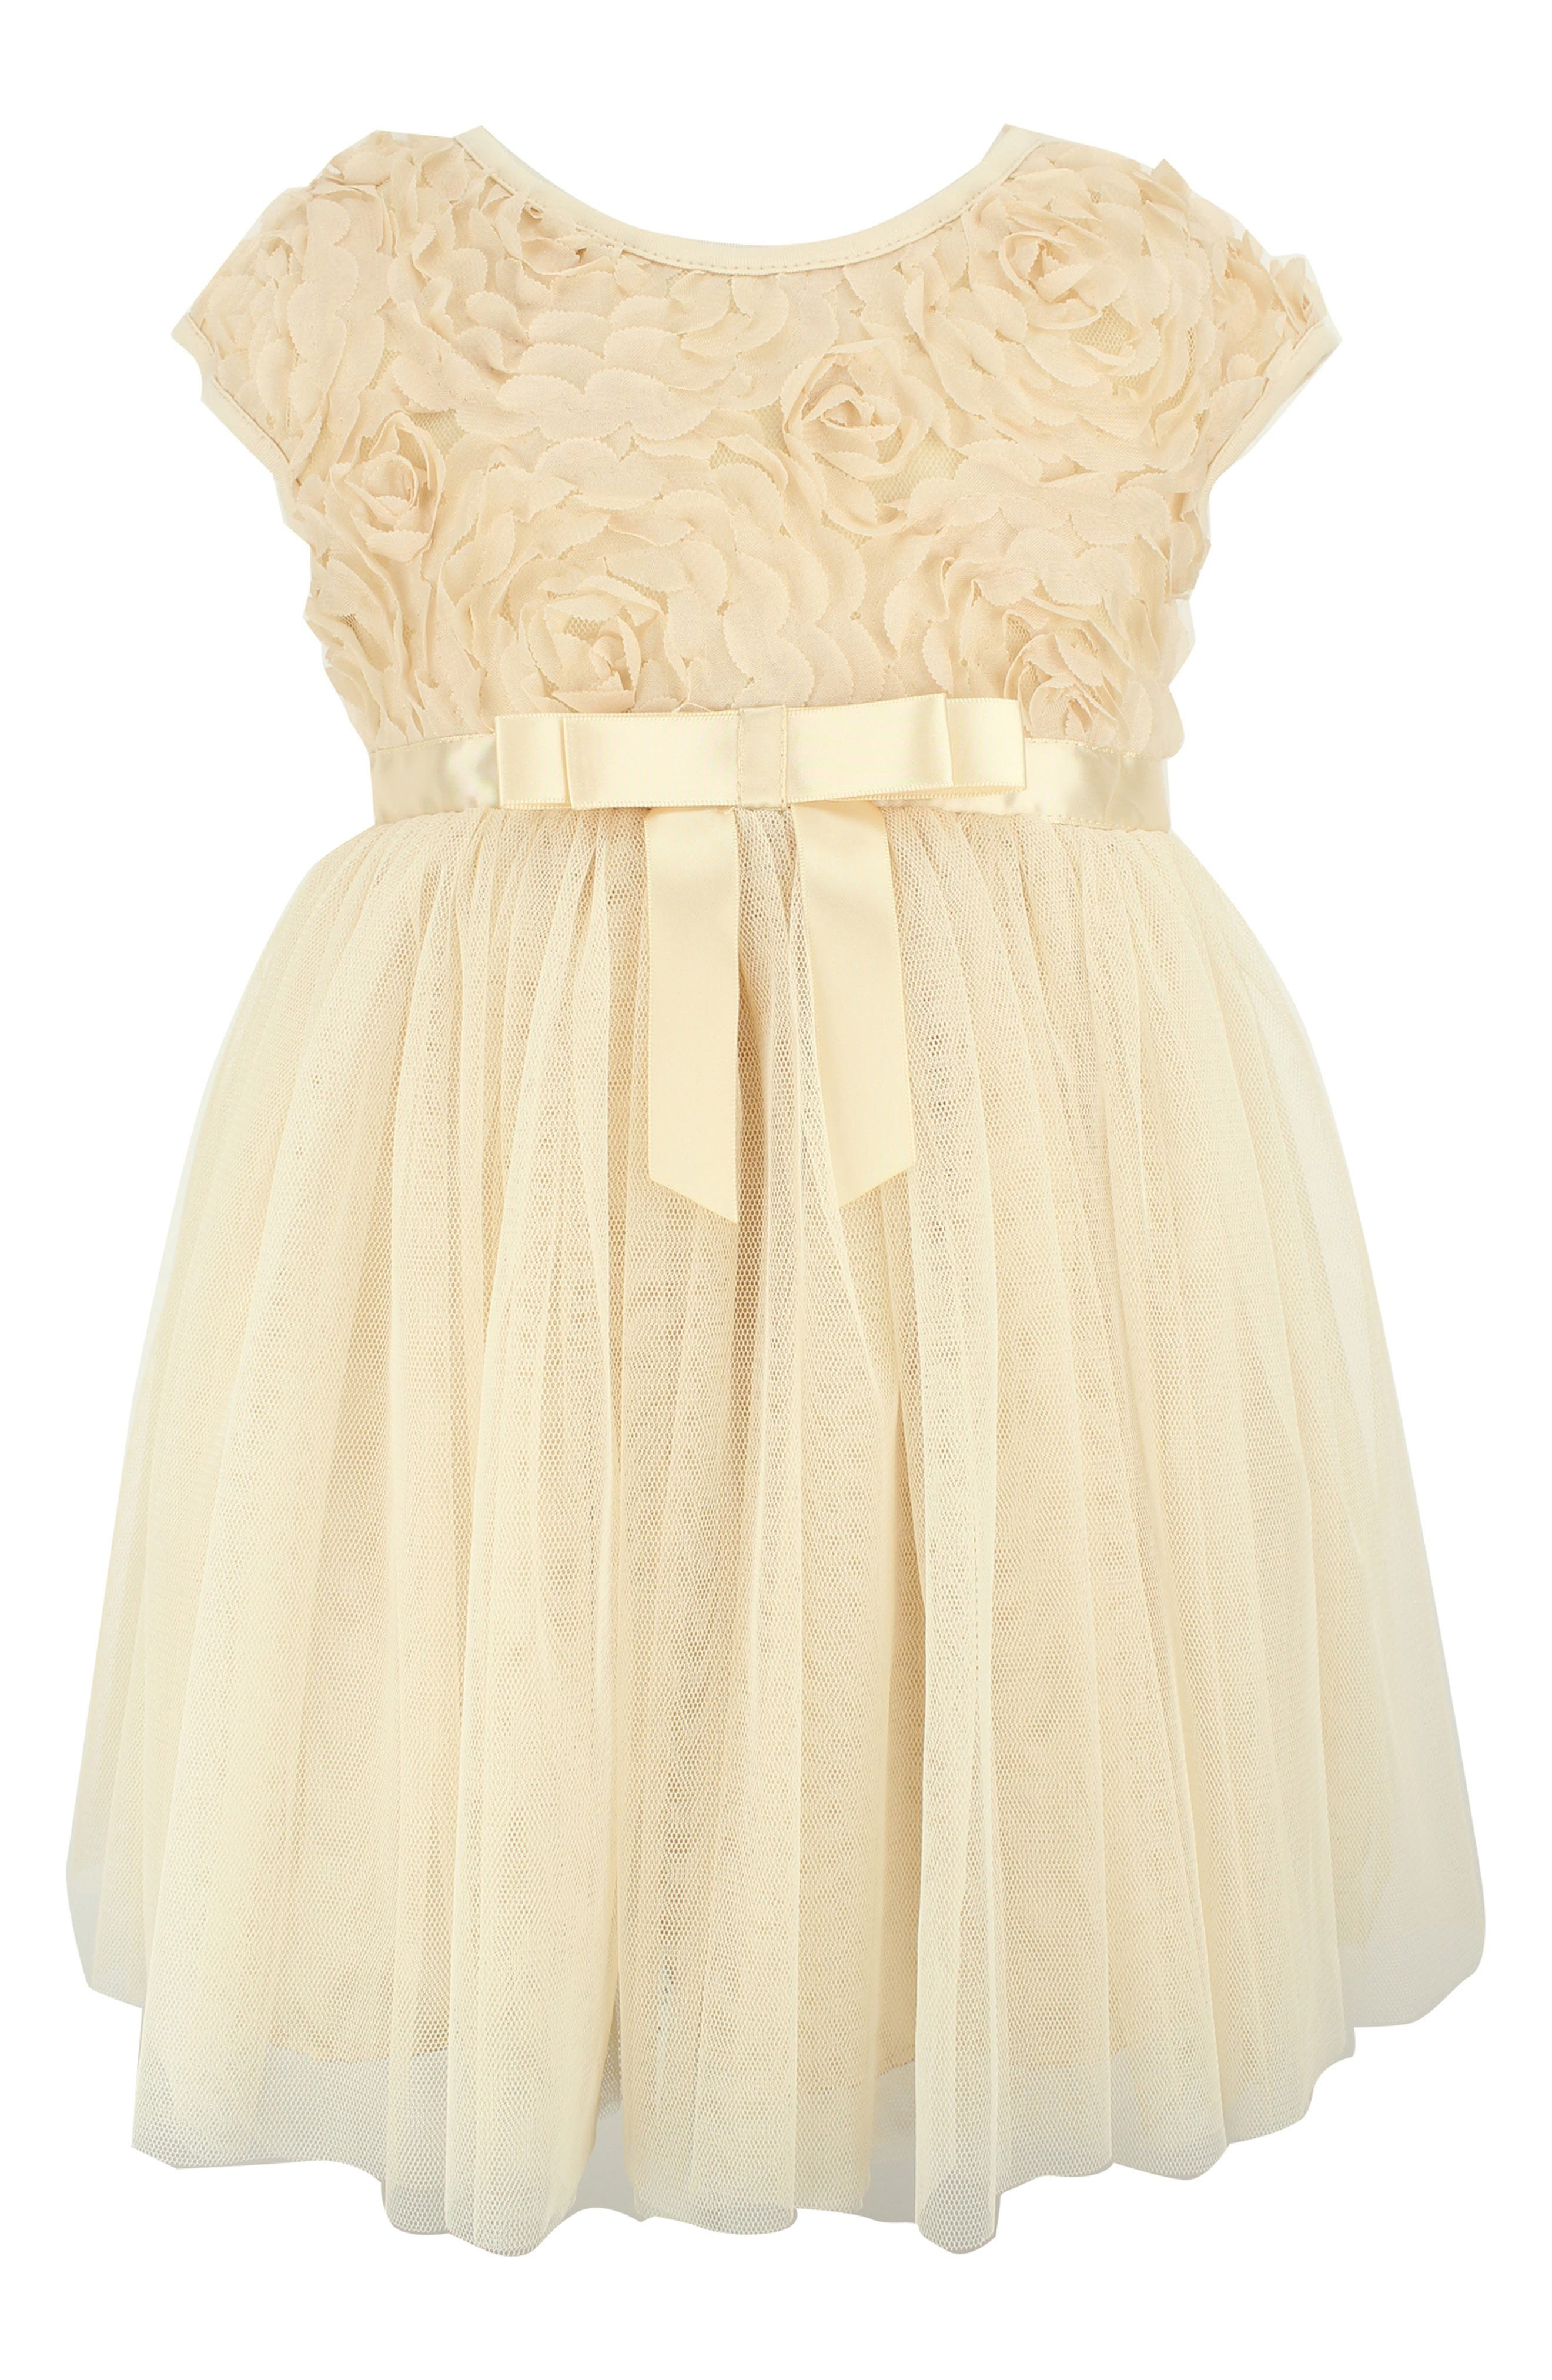 POPATU Rosette Tulle Dress, Main, color, IVORY